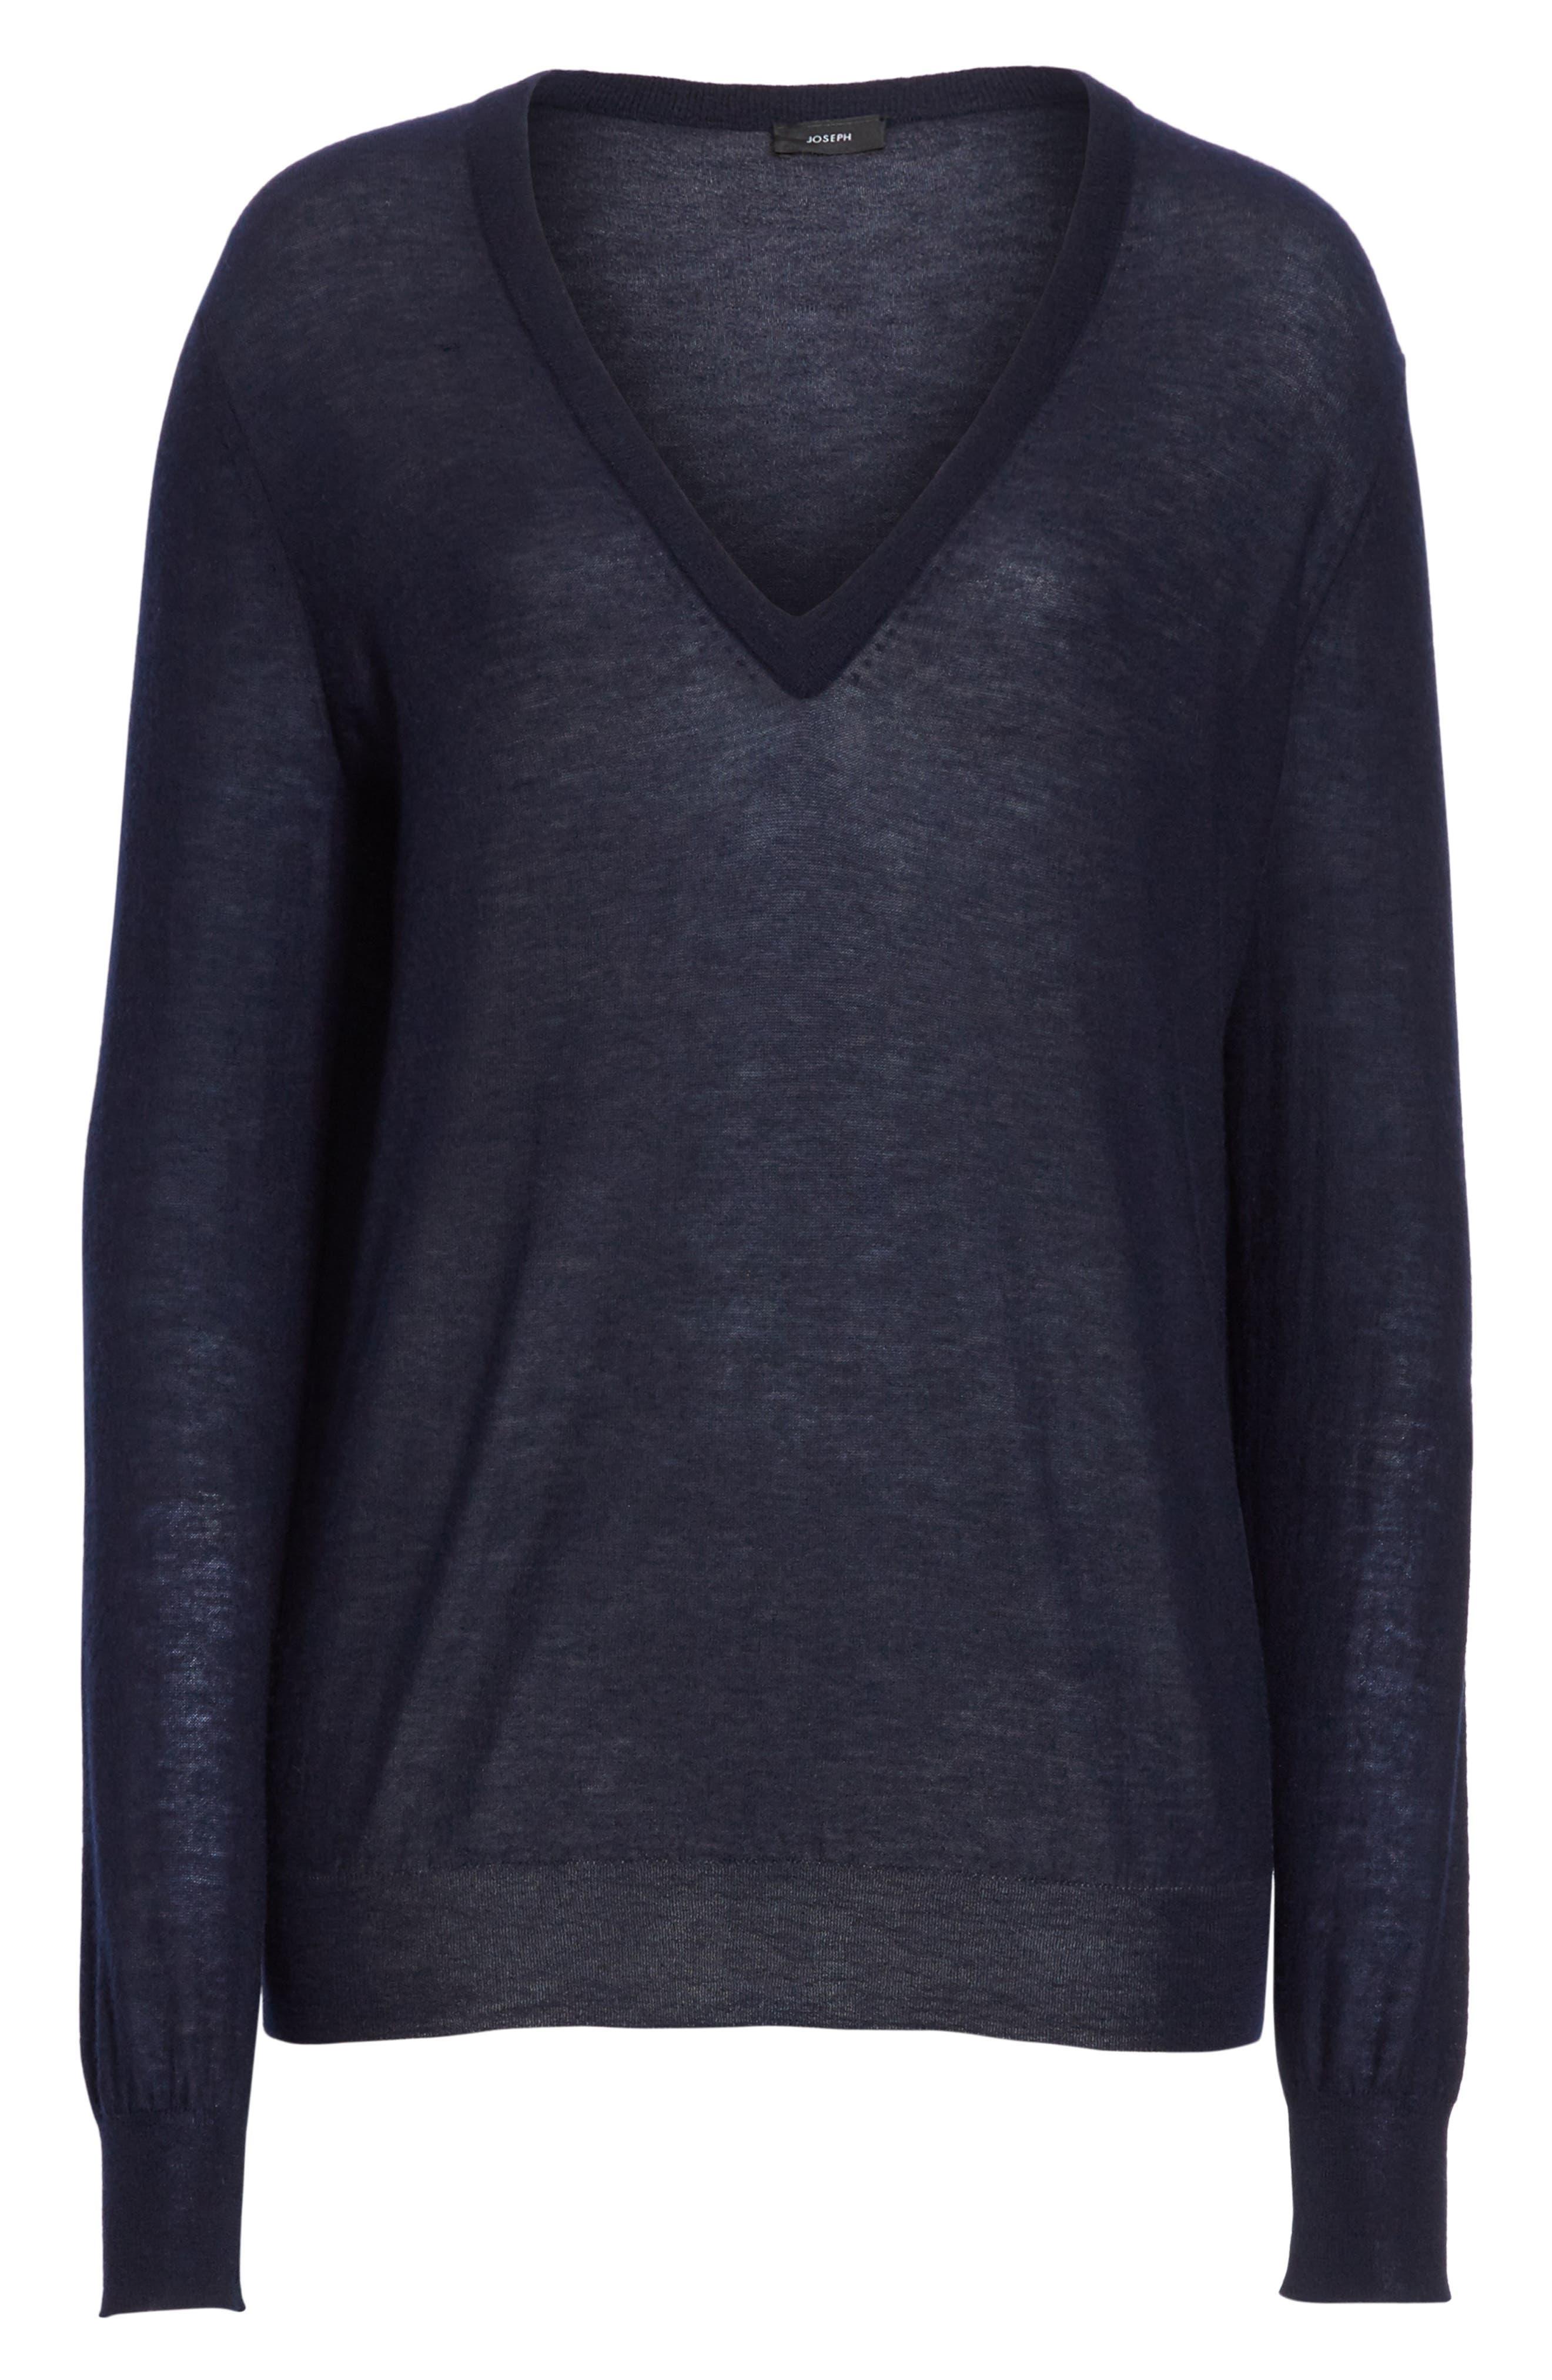 V-Neck Cashair Cashmere Sweater,                             Alternate thumbnail 6, color,                             Navy